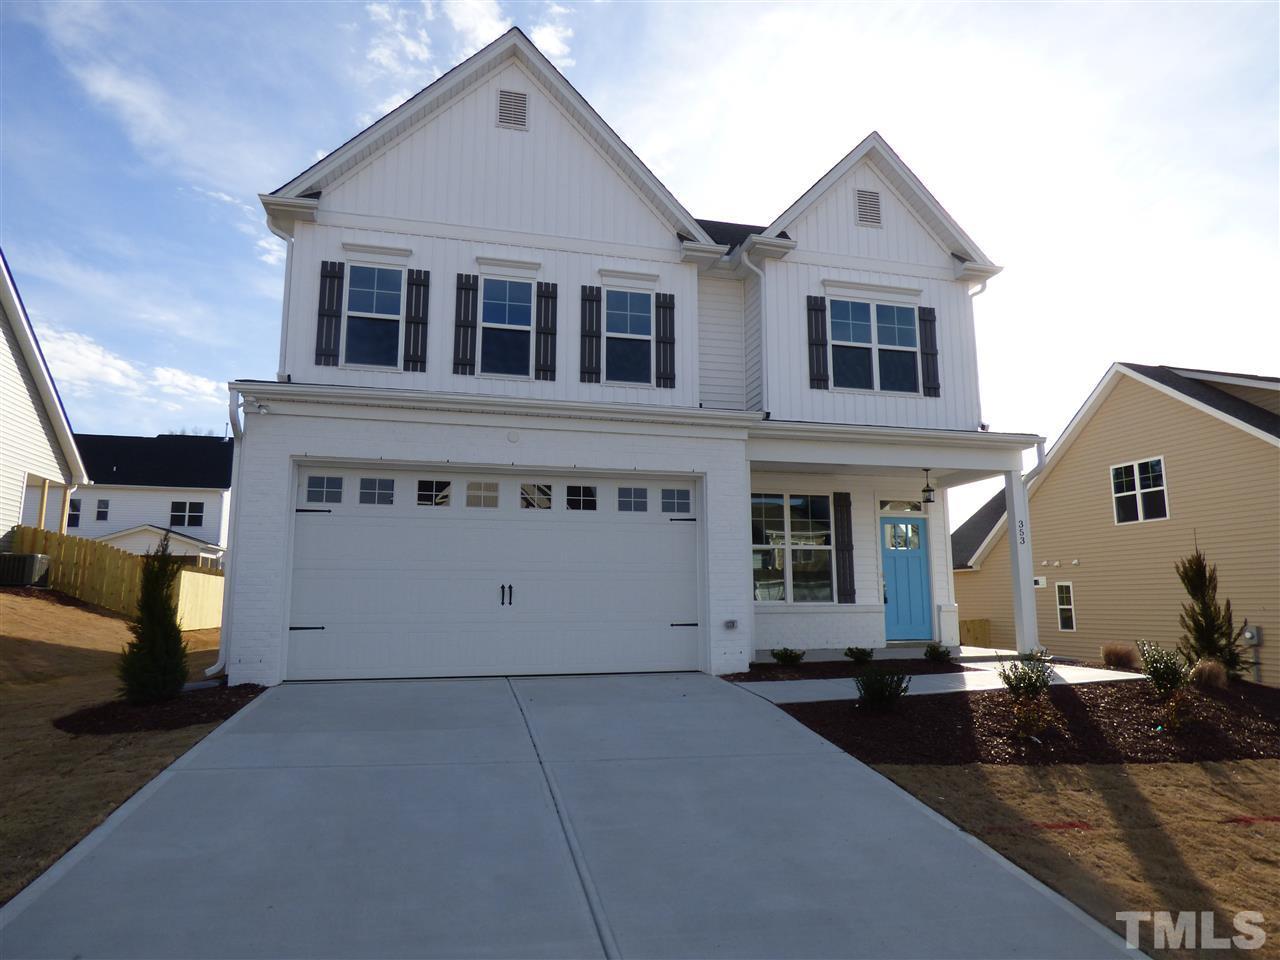 353 Cascade Hills Lane, The Bluffs at Joyner Park, Wake Forest NC (Homesite 21) - $312,986